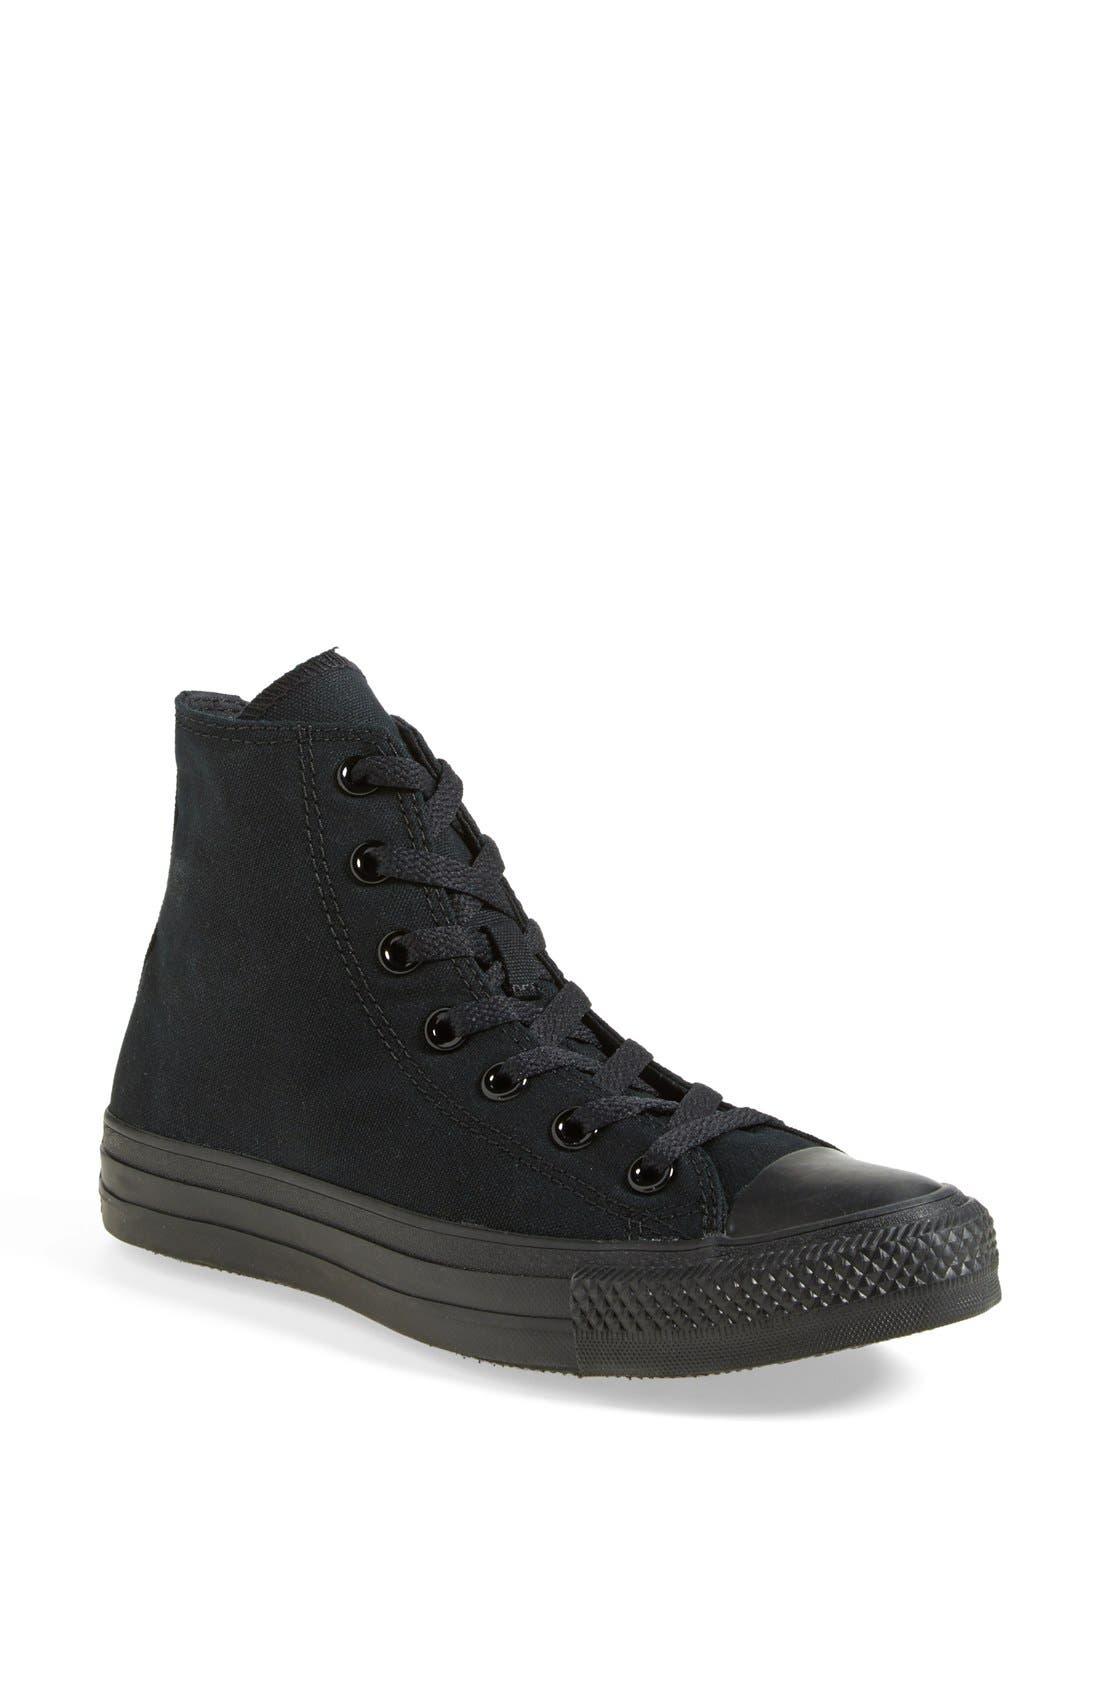 CONVERSE, Chuck Taylor<sup>®</sup> All Star<sup>®</sup> High Top Sneaker, Main thumbnail 1, color, 006